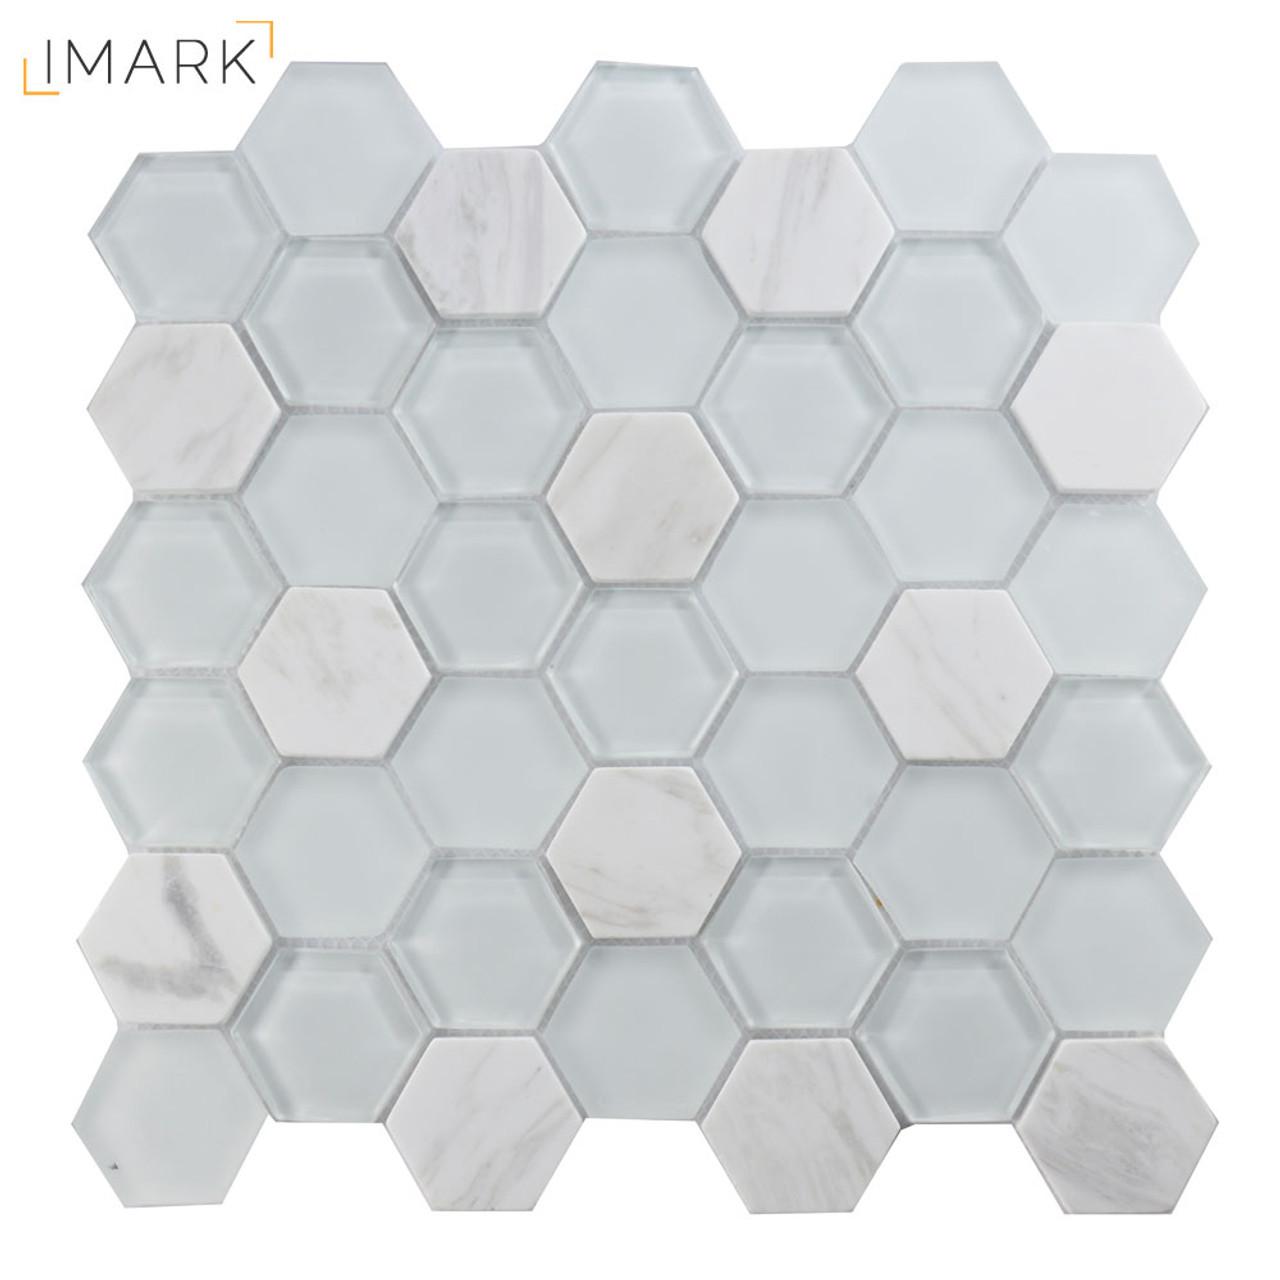 Hexagon Volakas Marble Mixed Glass Mosaic Tile For Kitchen